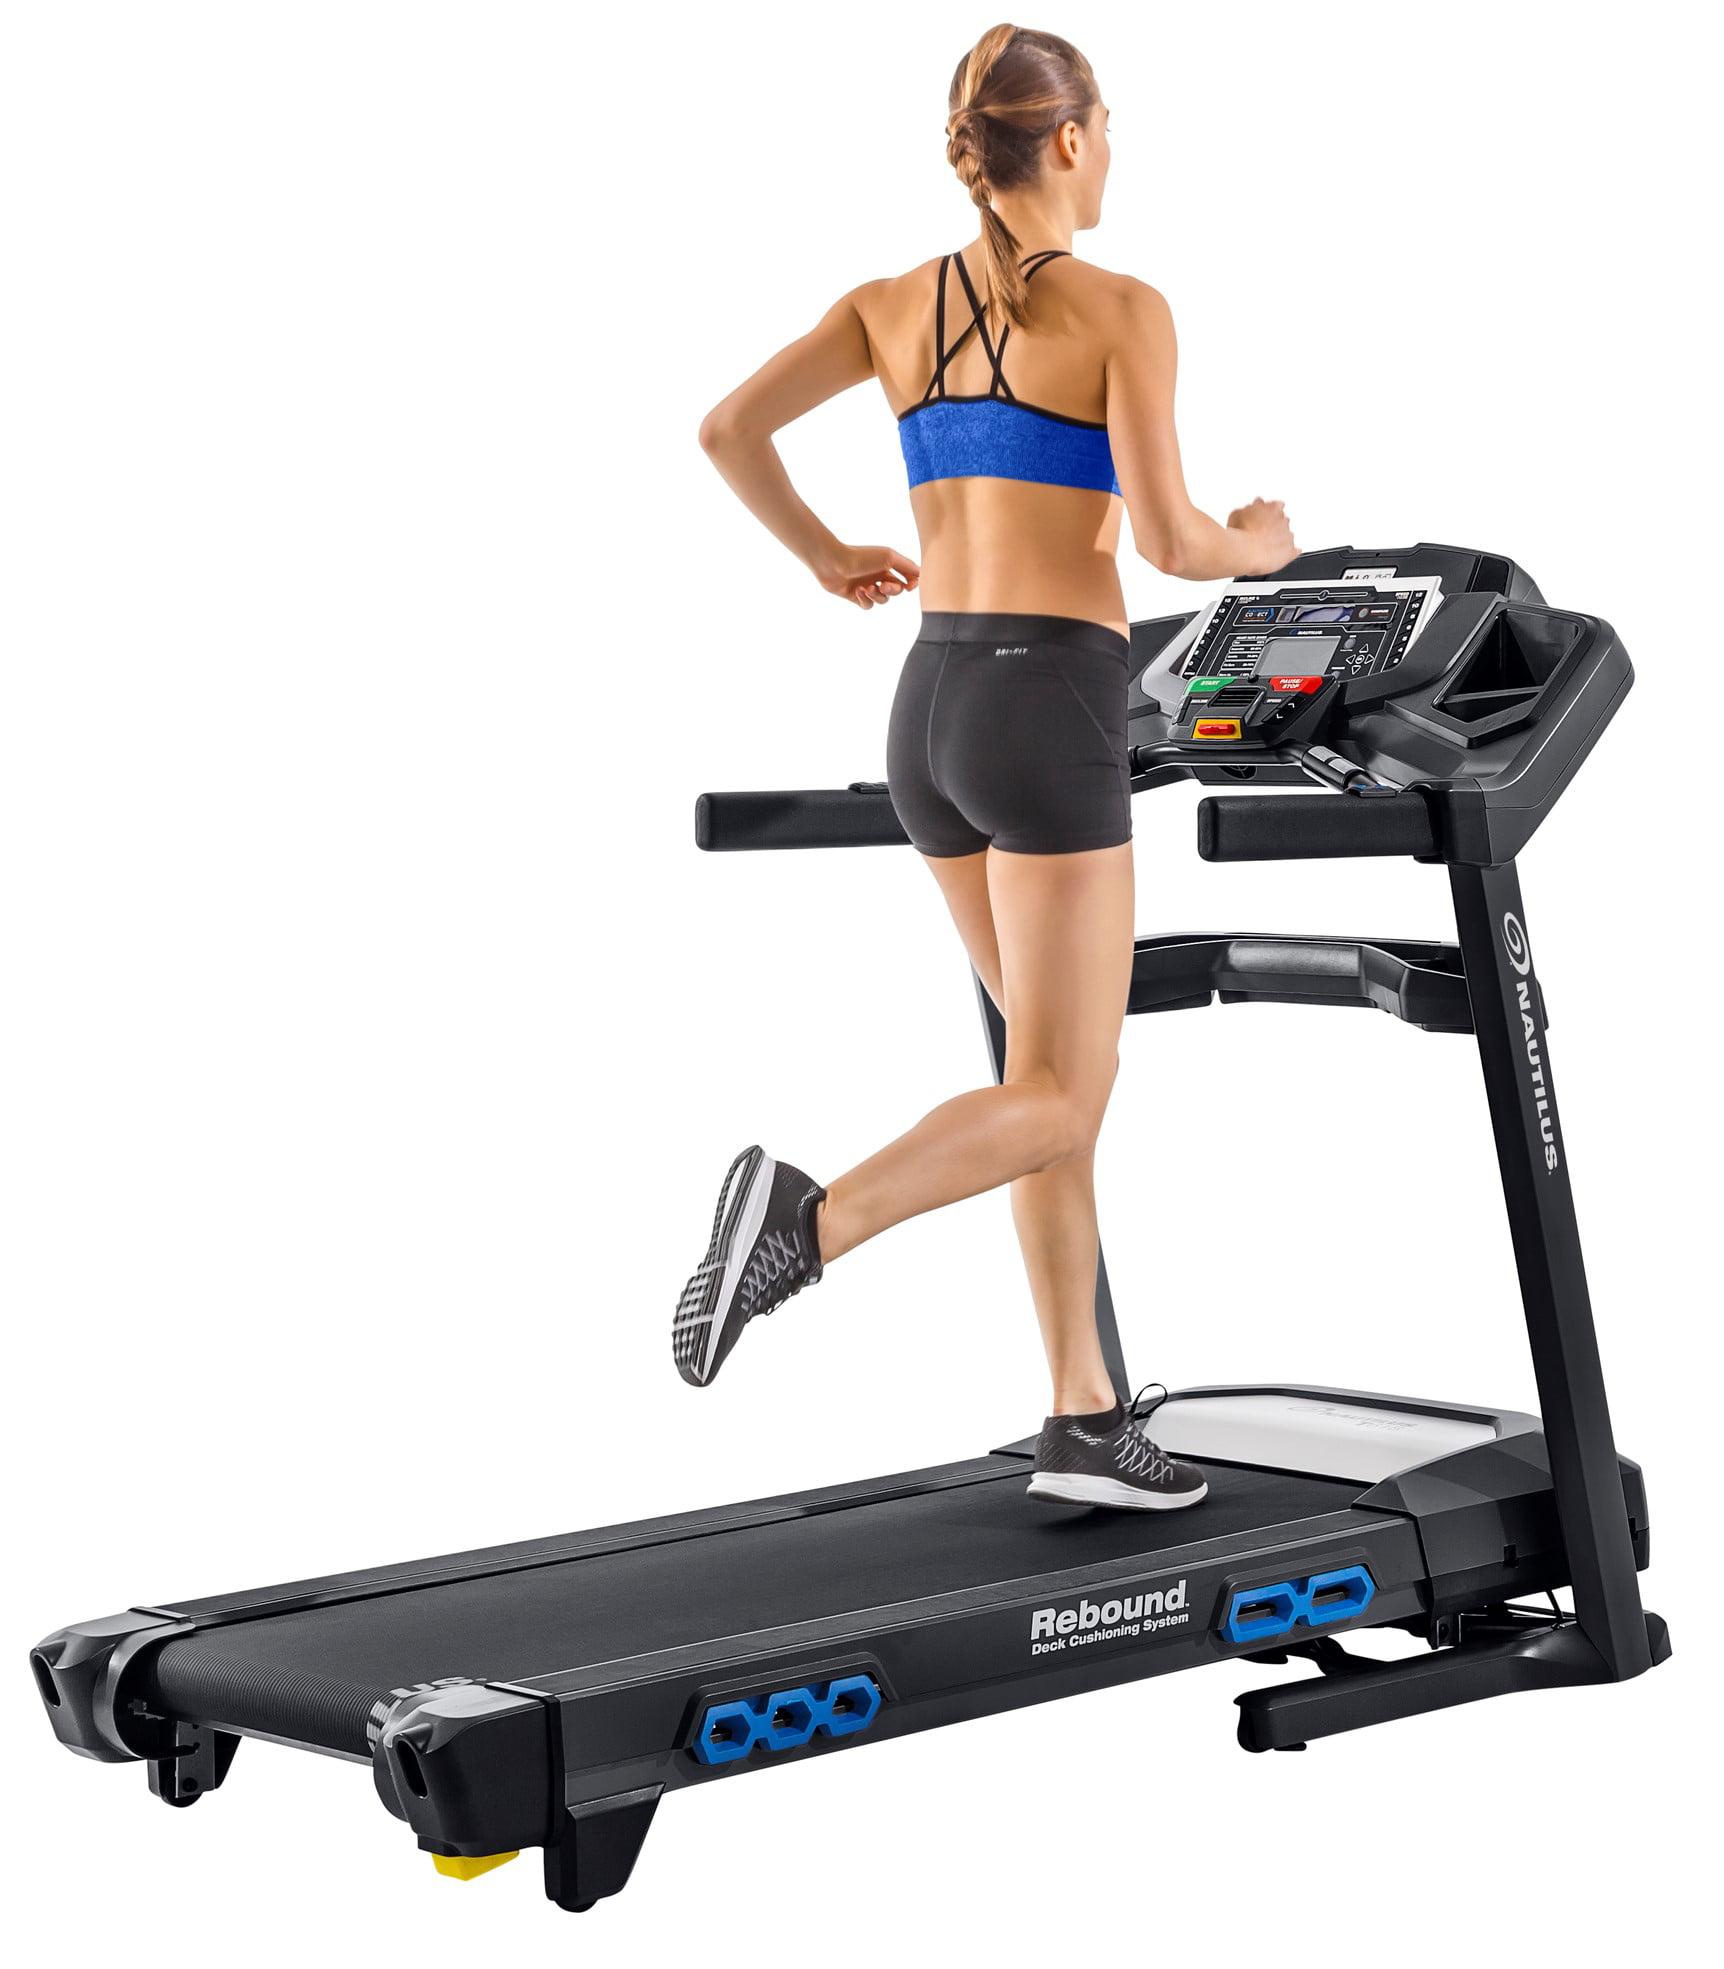 Nautilus T618 Bluetooth Treadmill with RunSocial & Nautilus Trainer 2 App Connectivity by Nautilus